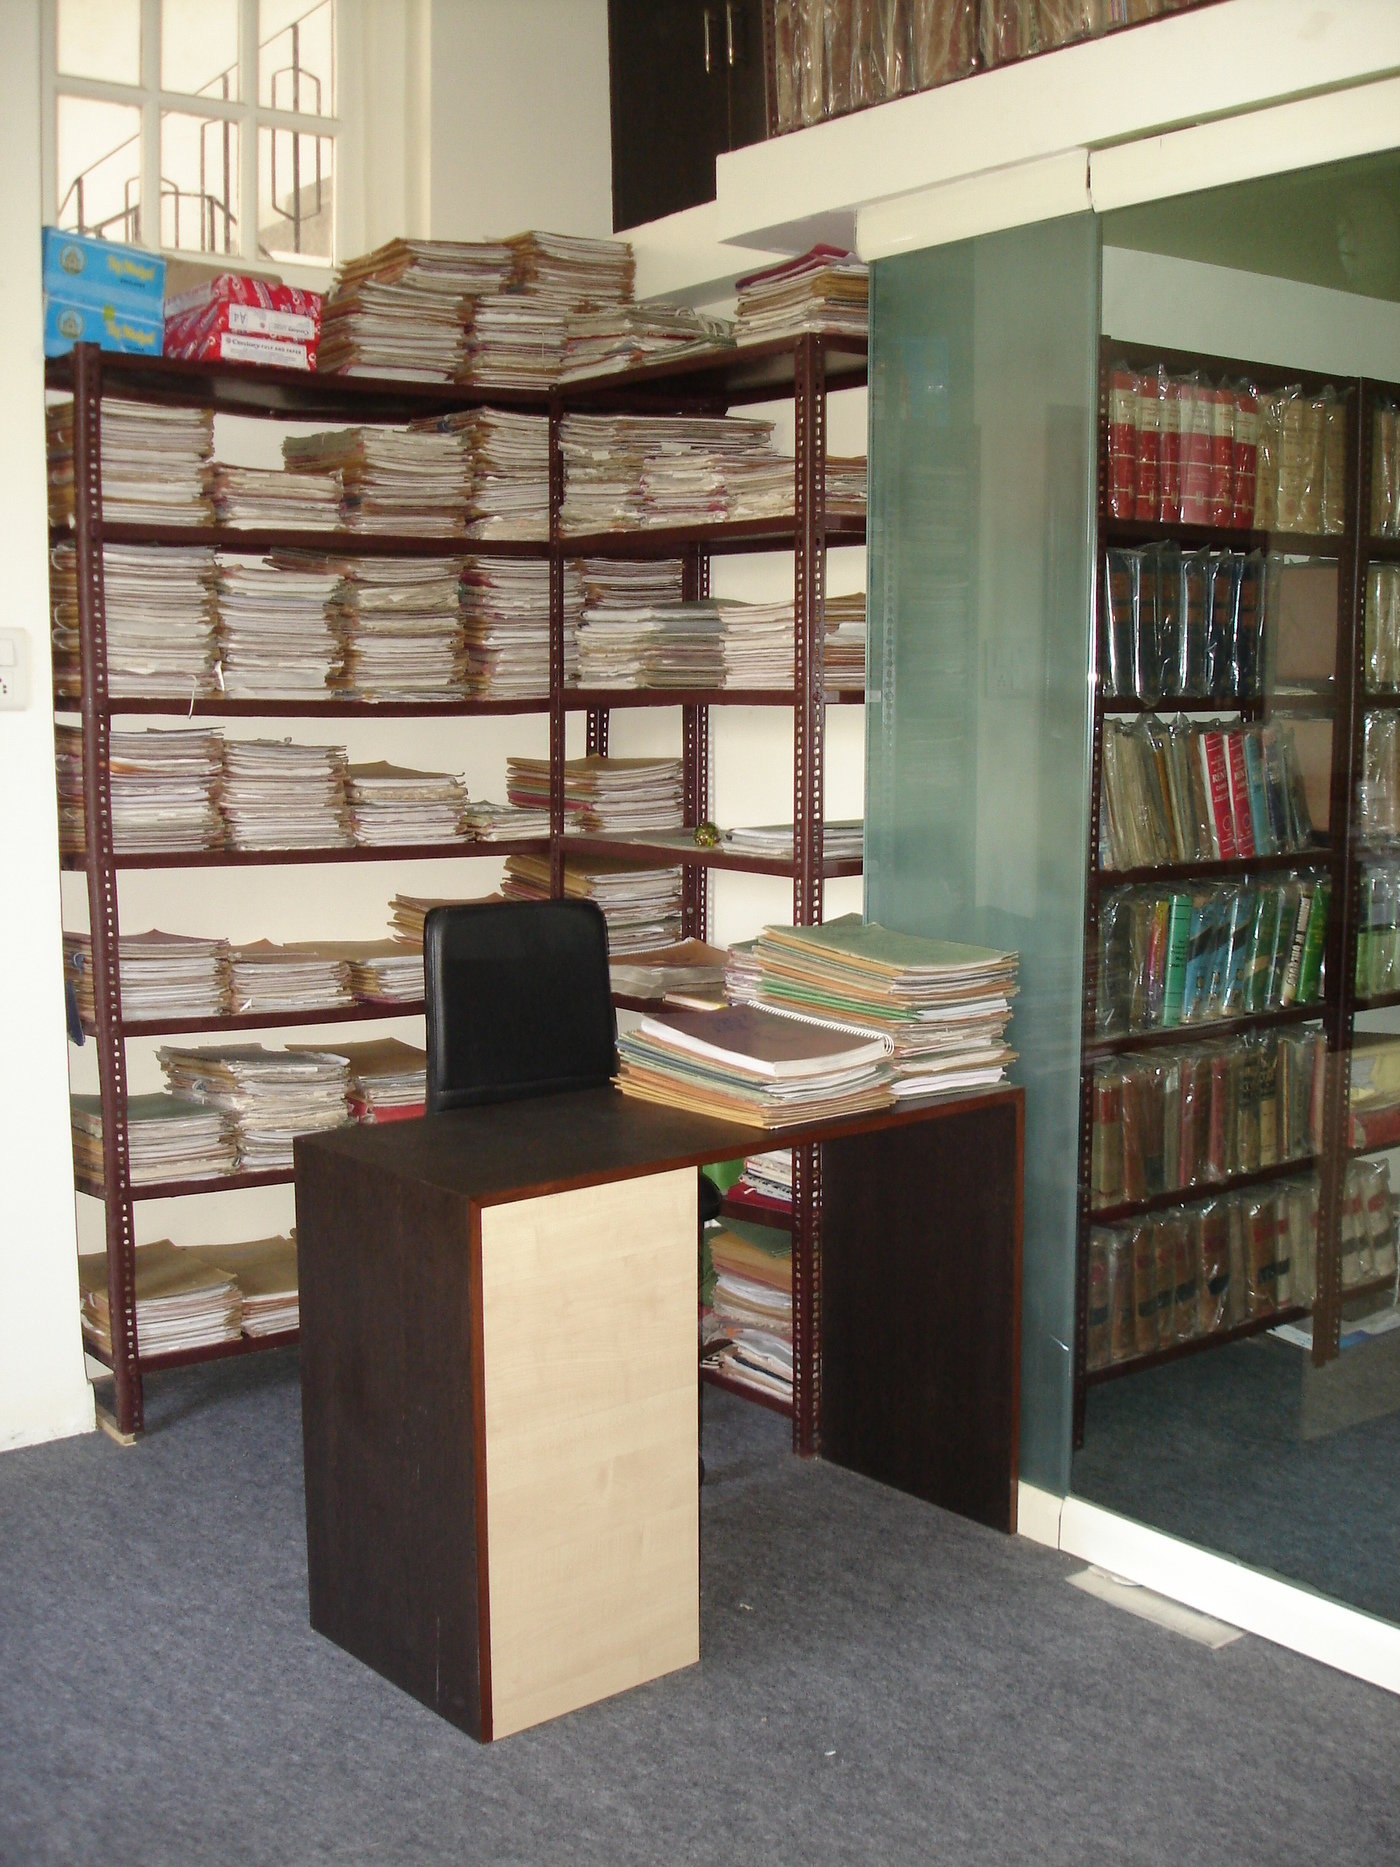 Advocate Office By Udita Bansal Agrawal At Coroflot Com